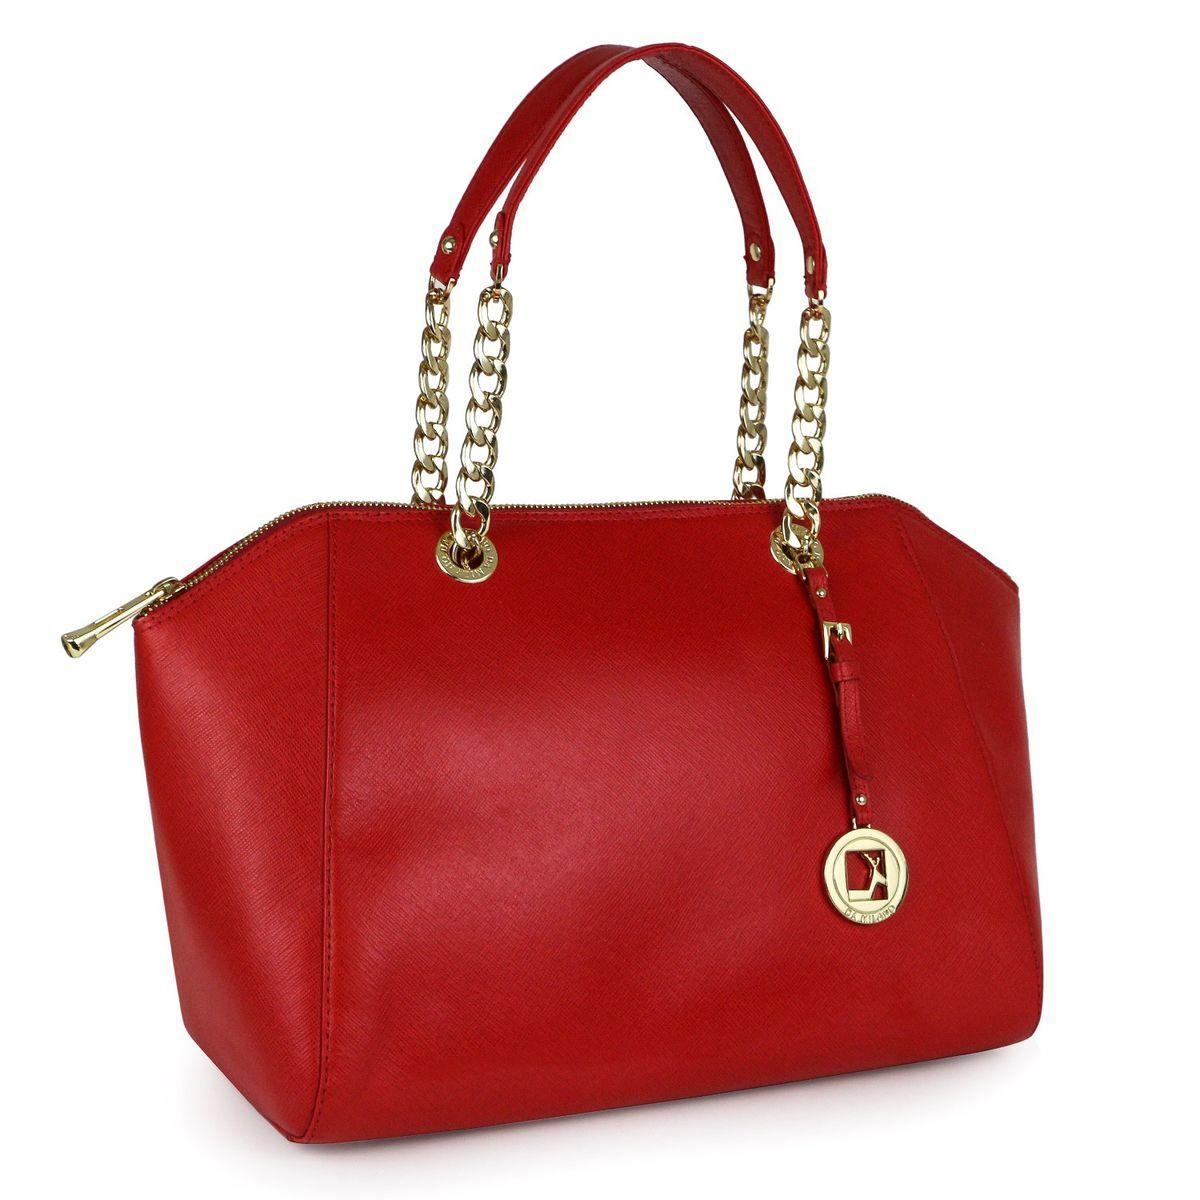 662480bc4c Da Milano Women Lb-2069 Coral Red Handbag